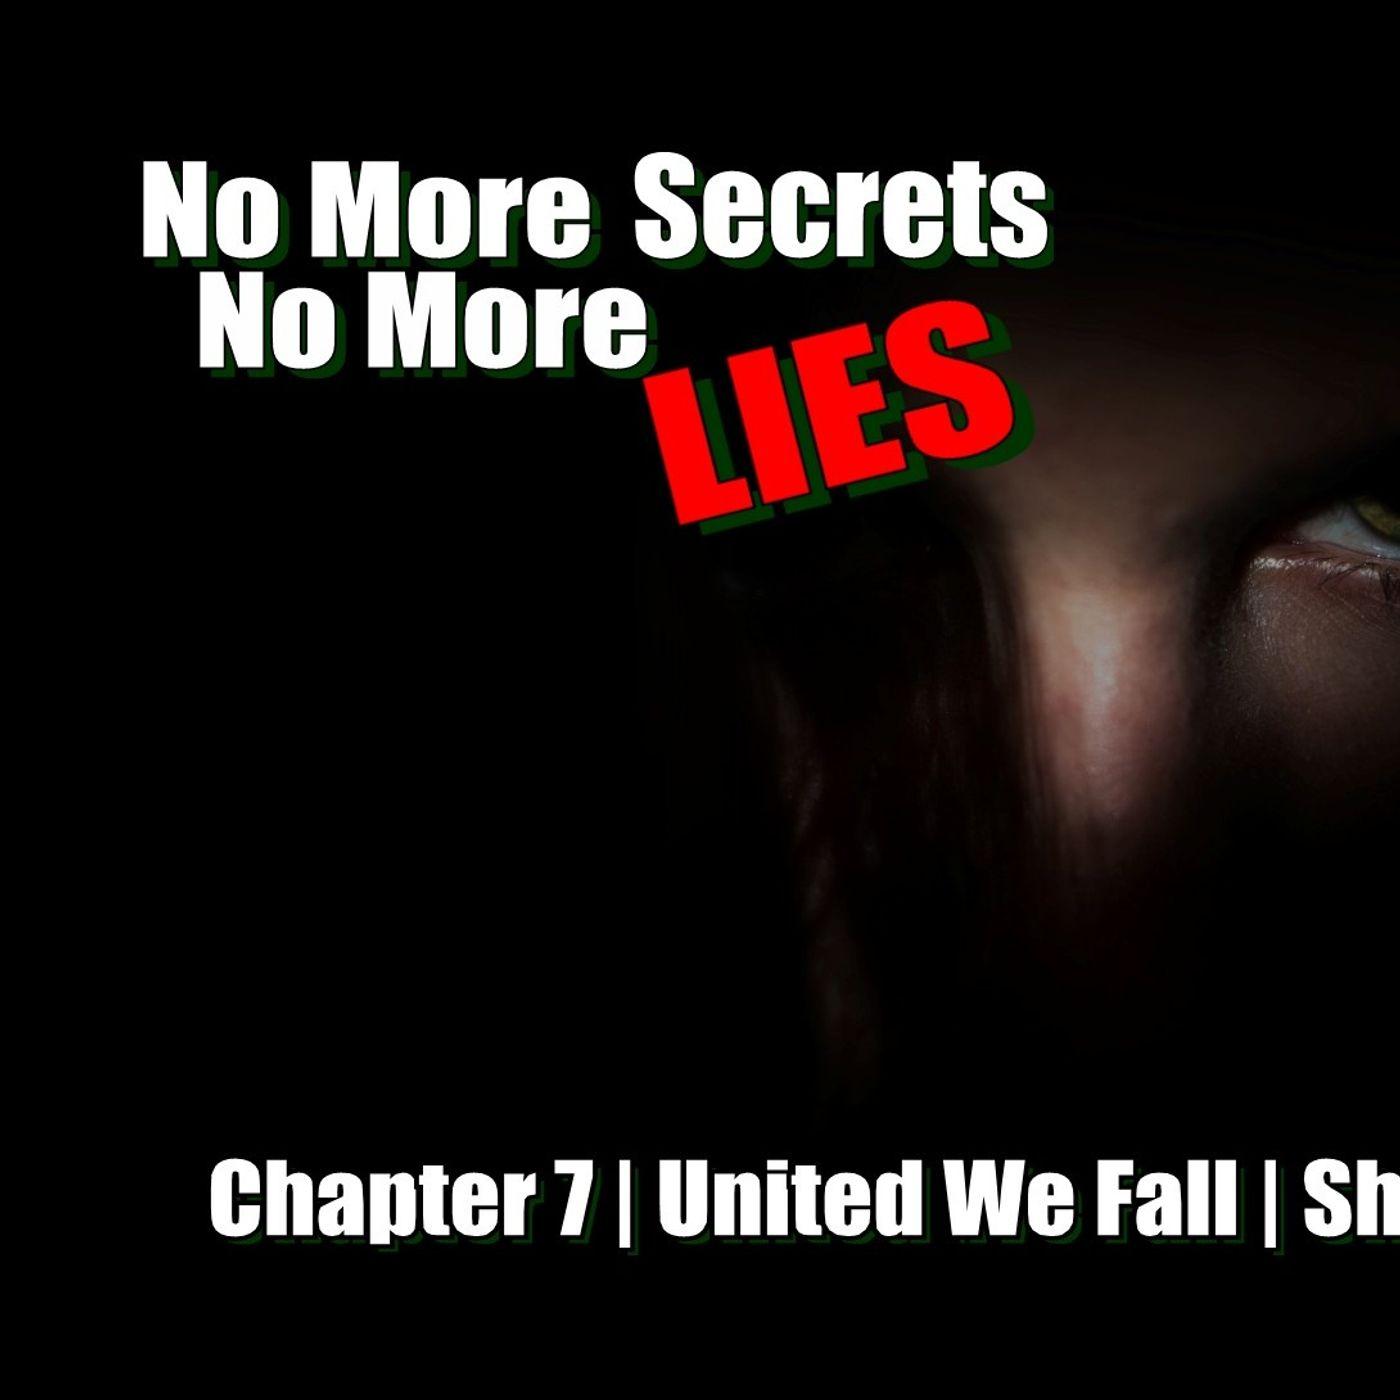 United We Fall - Chapter 7 - No More Secrets No More Lies